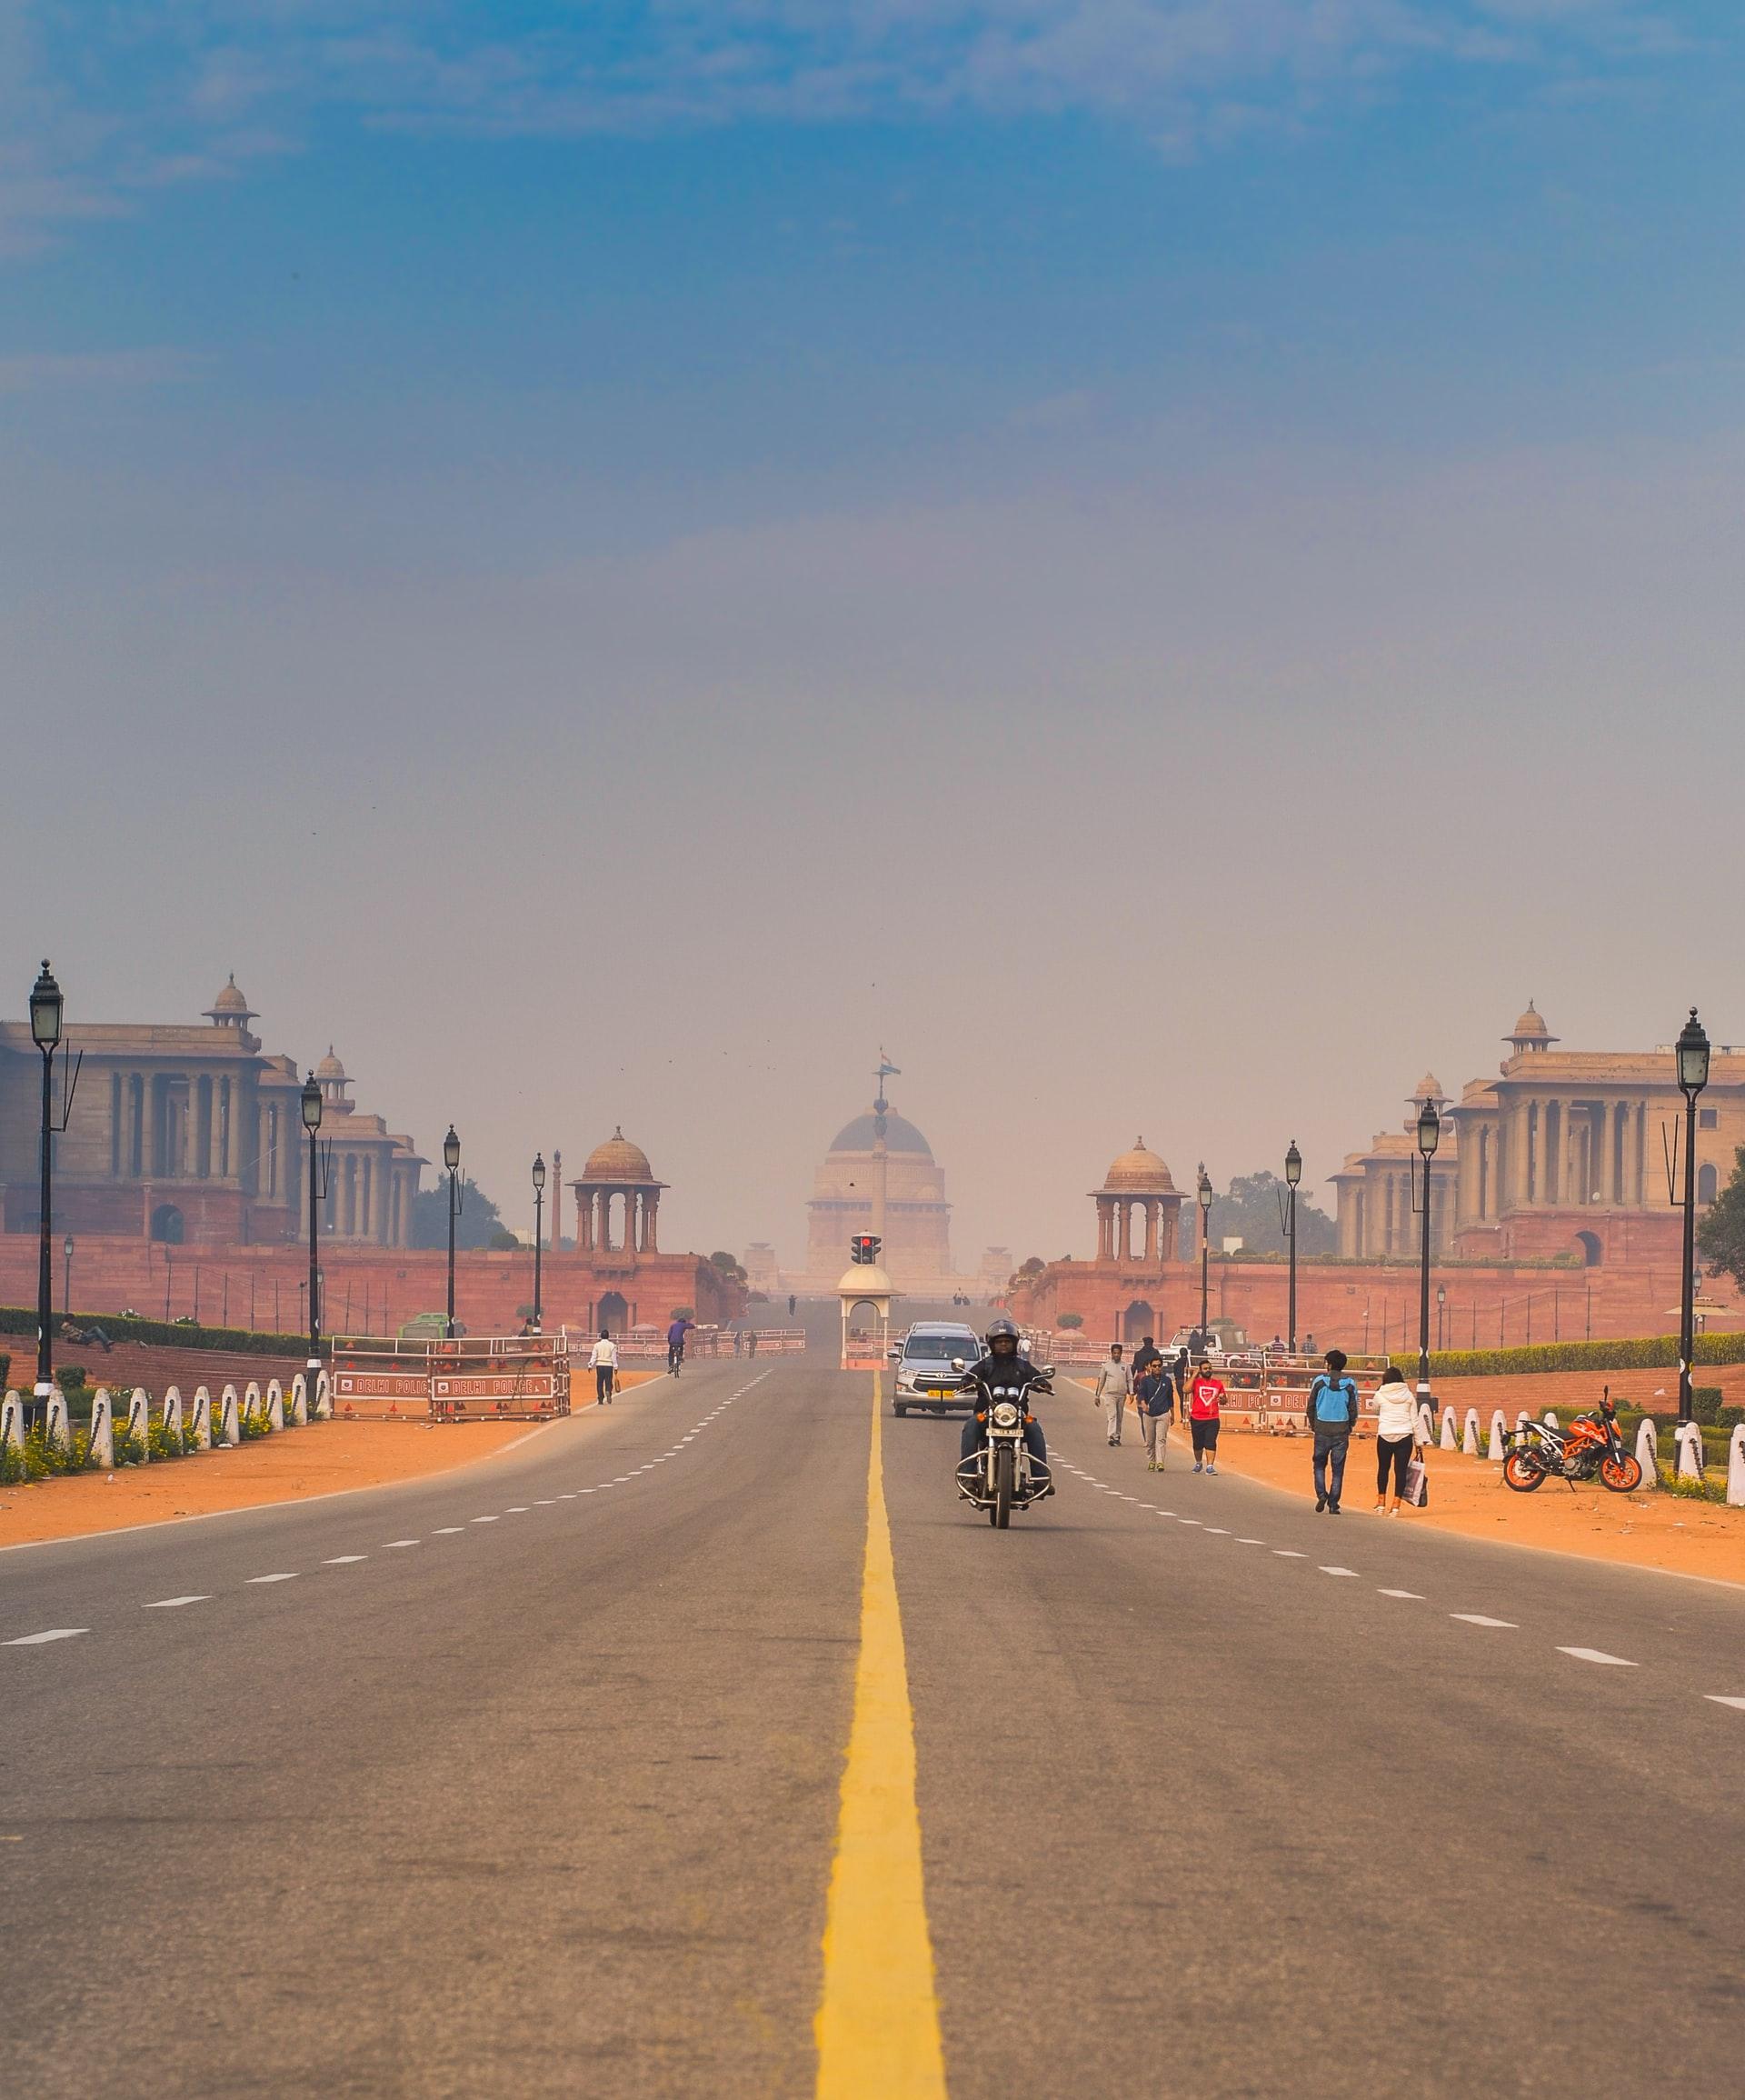 Lutyens' Delhi: British Architecture in Indian Culture